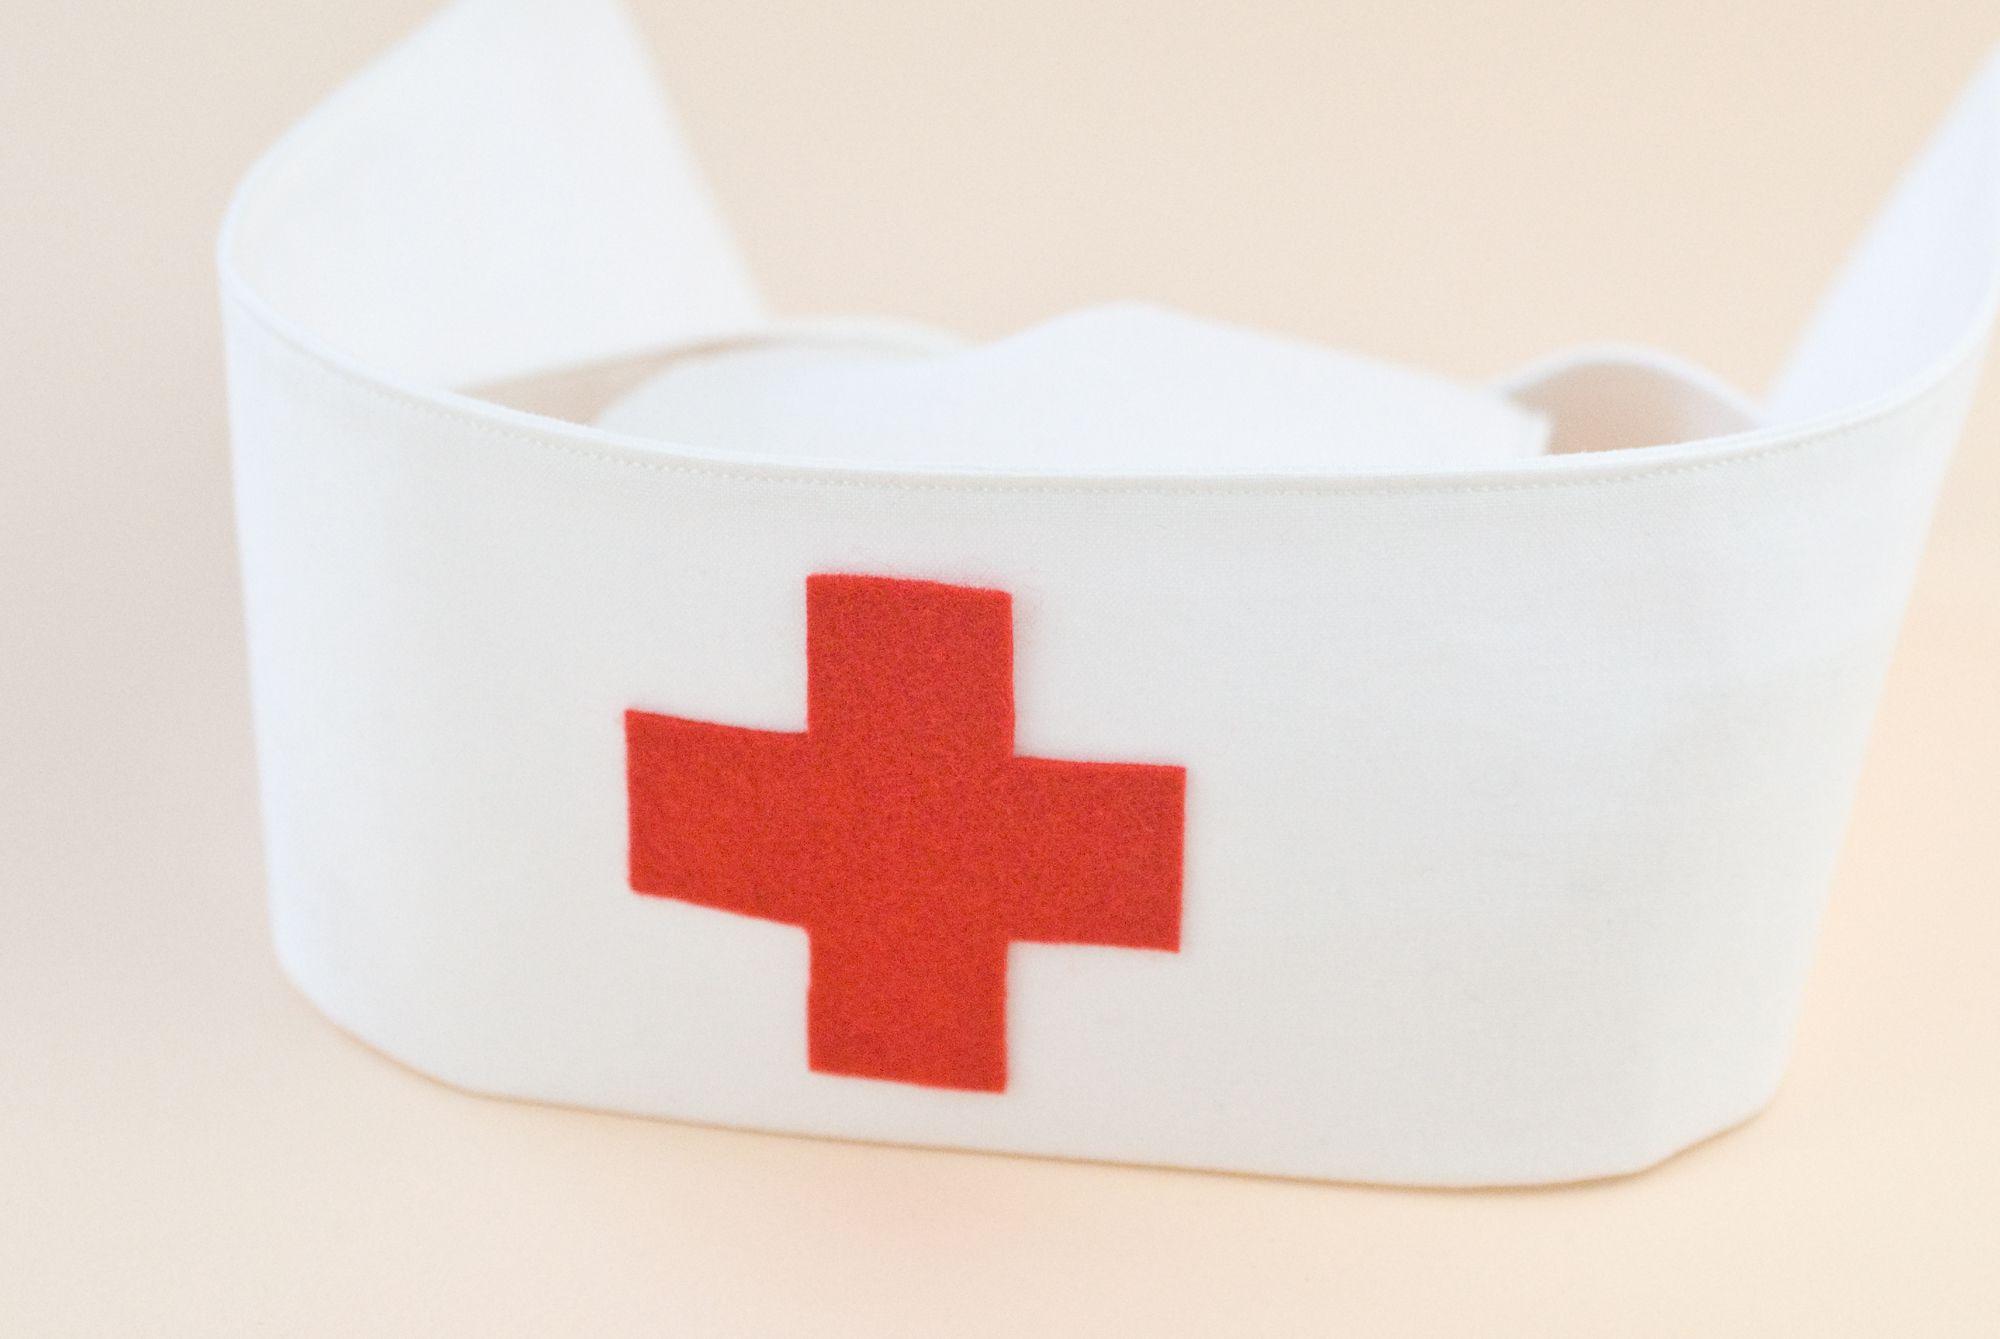 felt red cross on nurse's hat